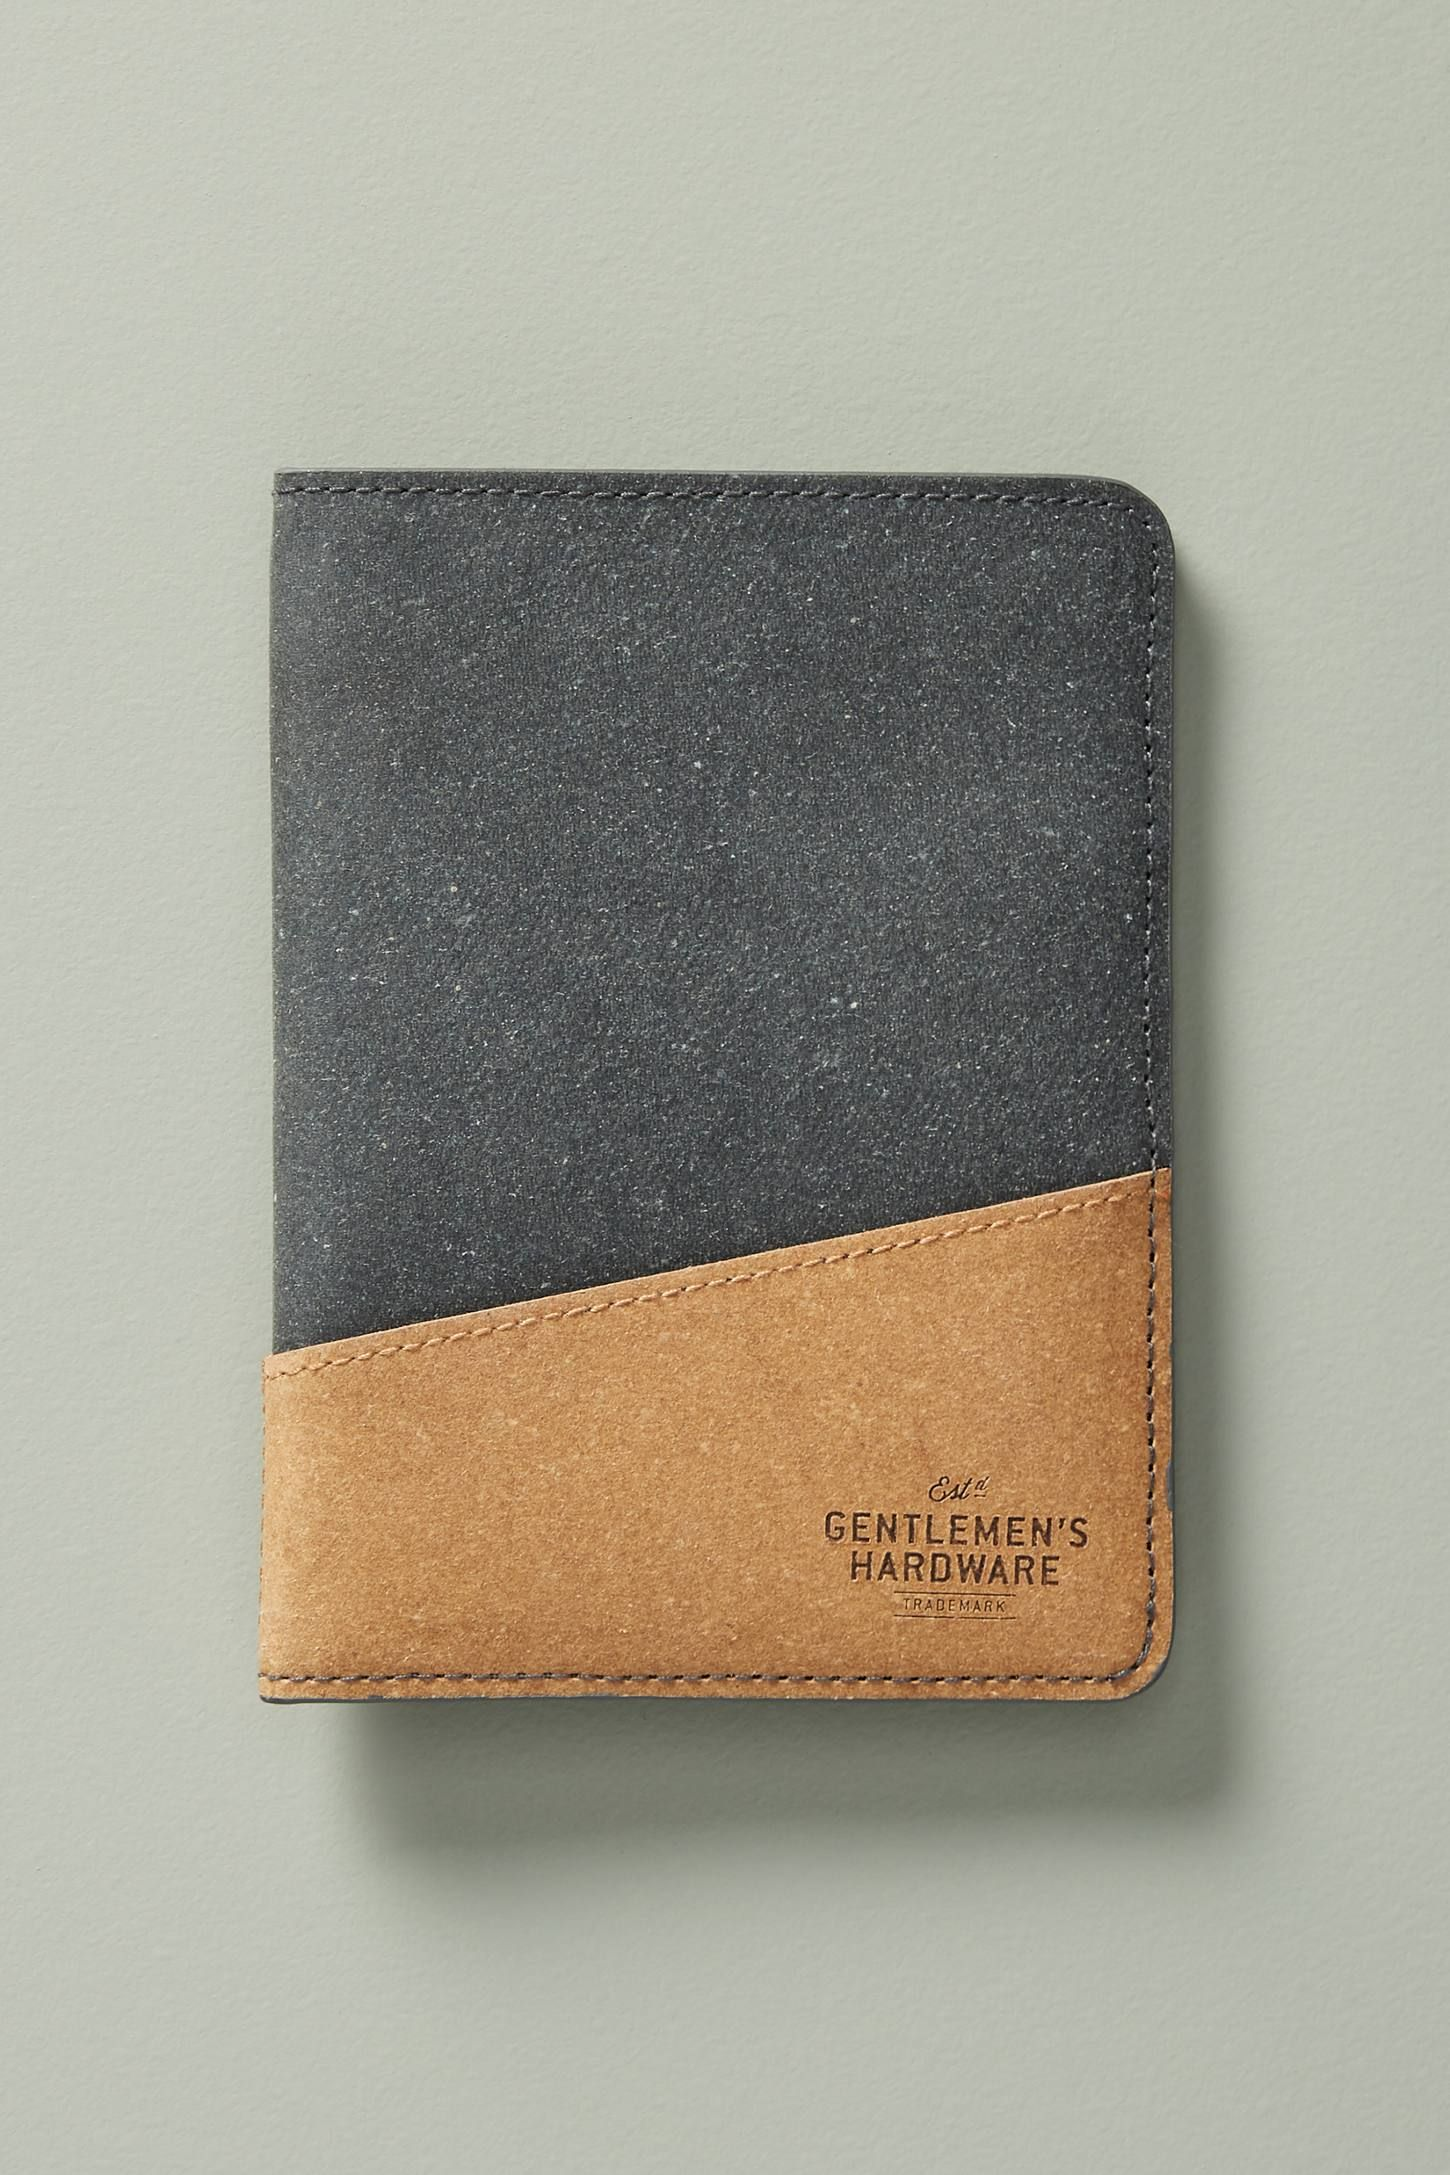 Gentlemen's Hardware Travel Wallet | Anthropologie | Gifts For Men | White Elephant Gift | Gifts For Dad | Gifs For Boyfriend | Christmas Gift Ideas ...